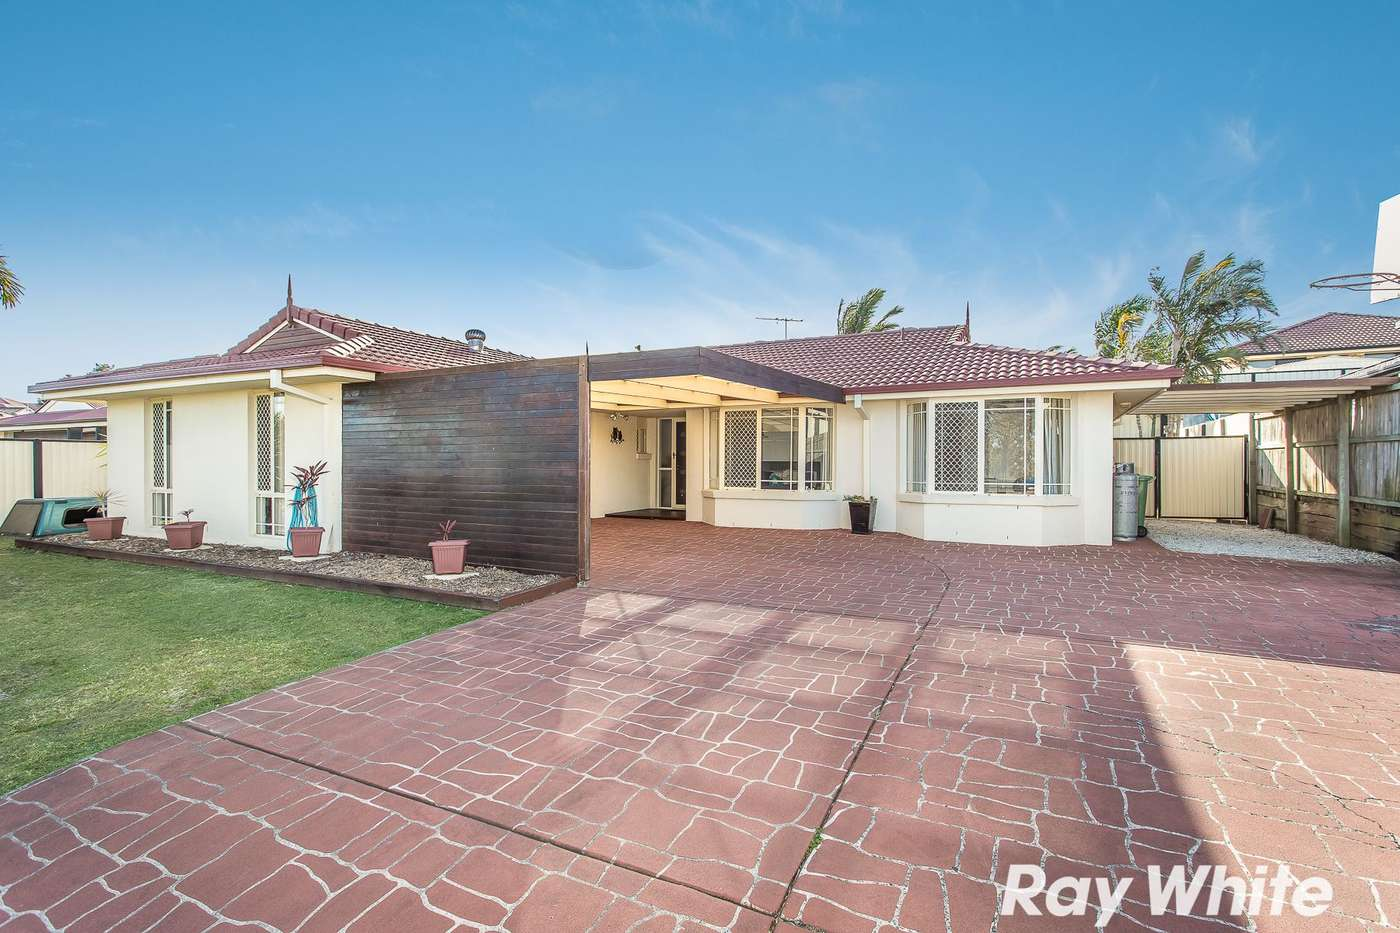 Main view of Homely house listing, 3 Raimondo Court, Dakabin, QLD 4503